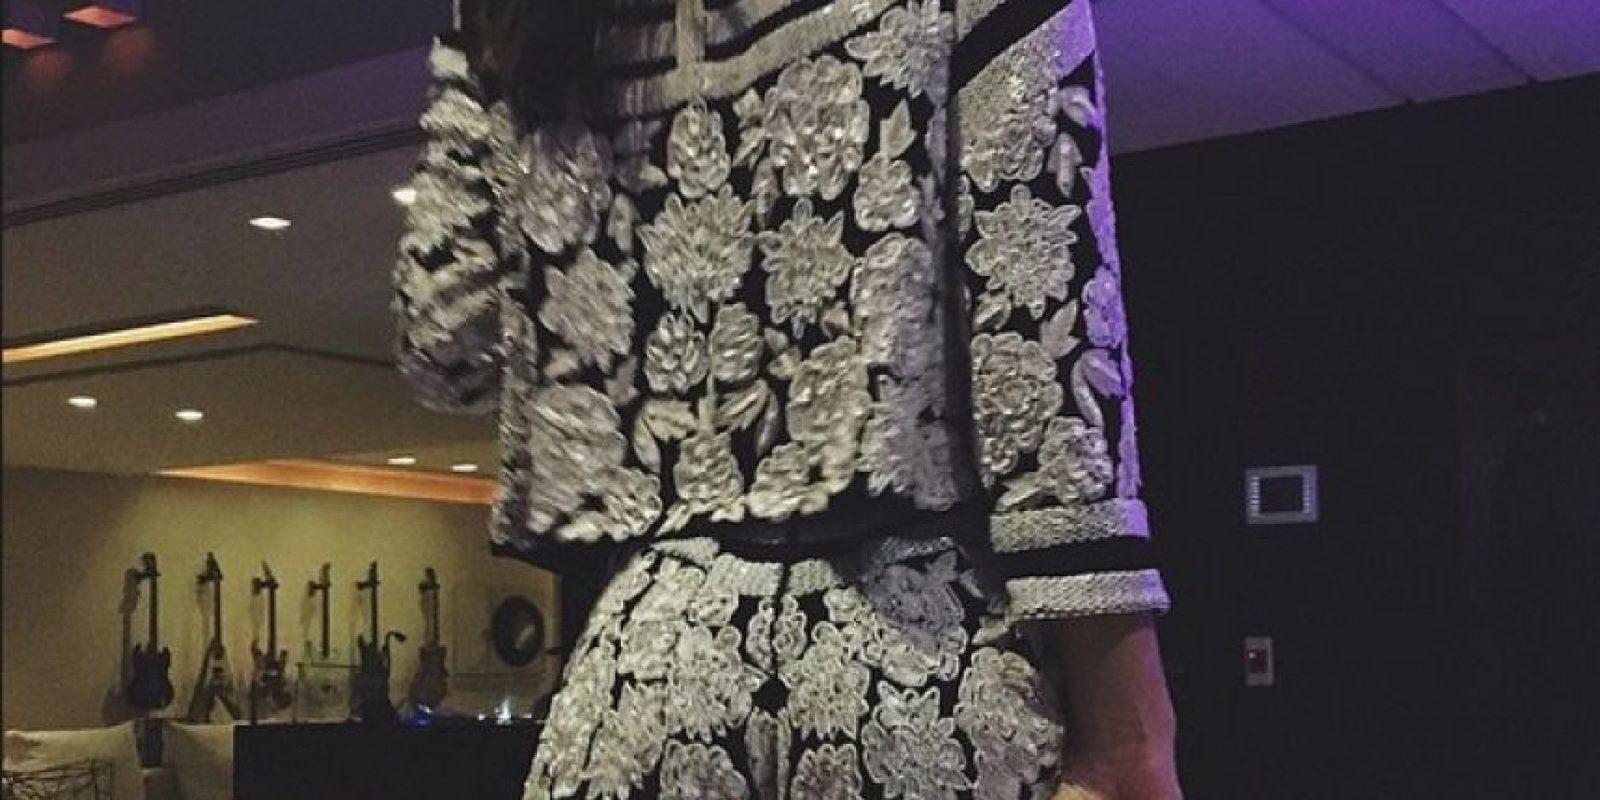 Kendall volvió a generar polémica por presumir su trasero. Foto:Instagram/KendallJenner